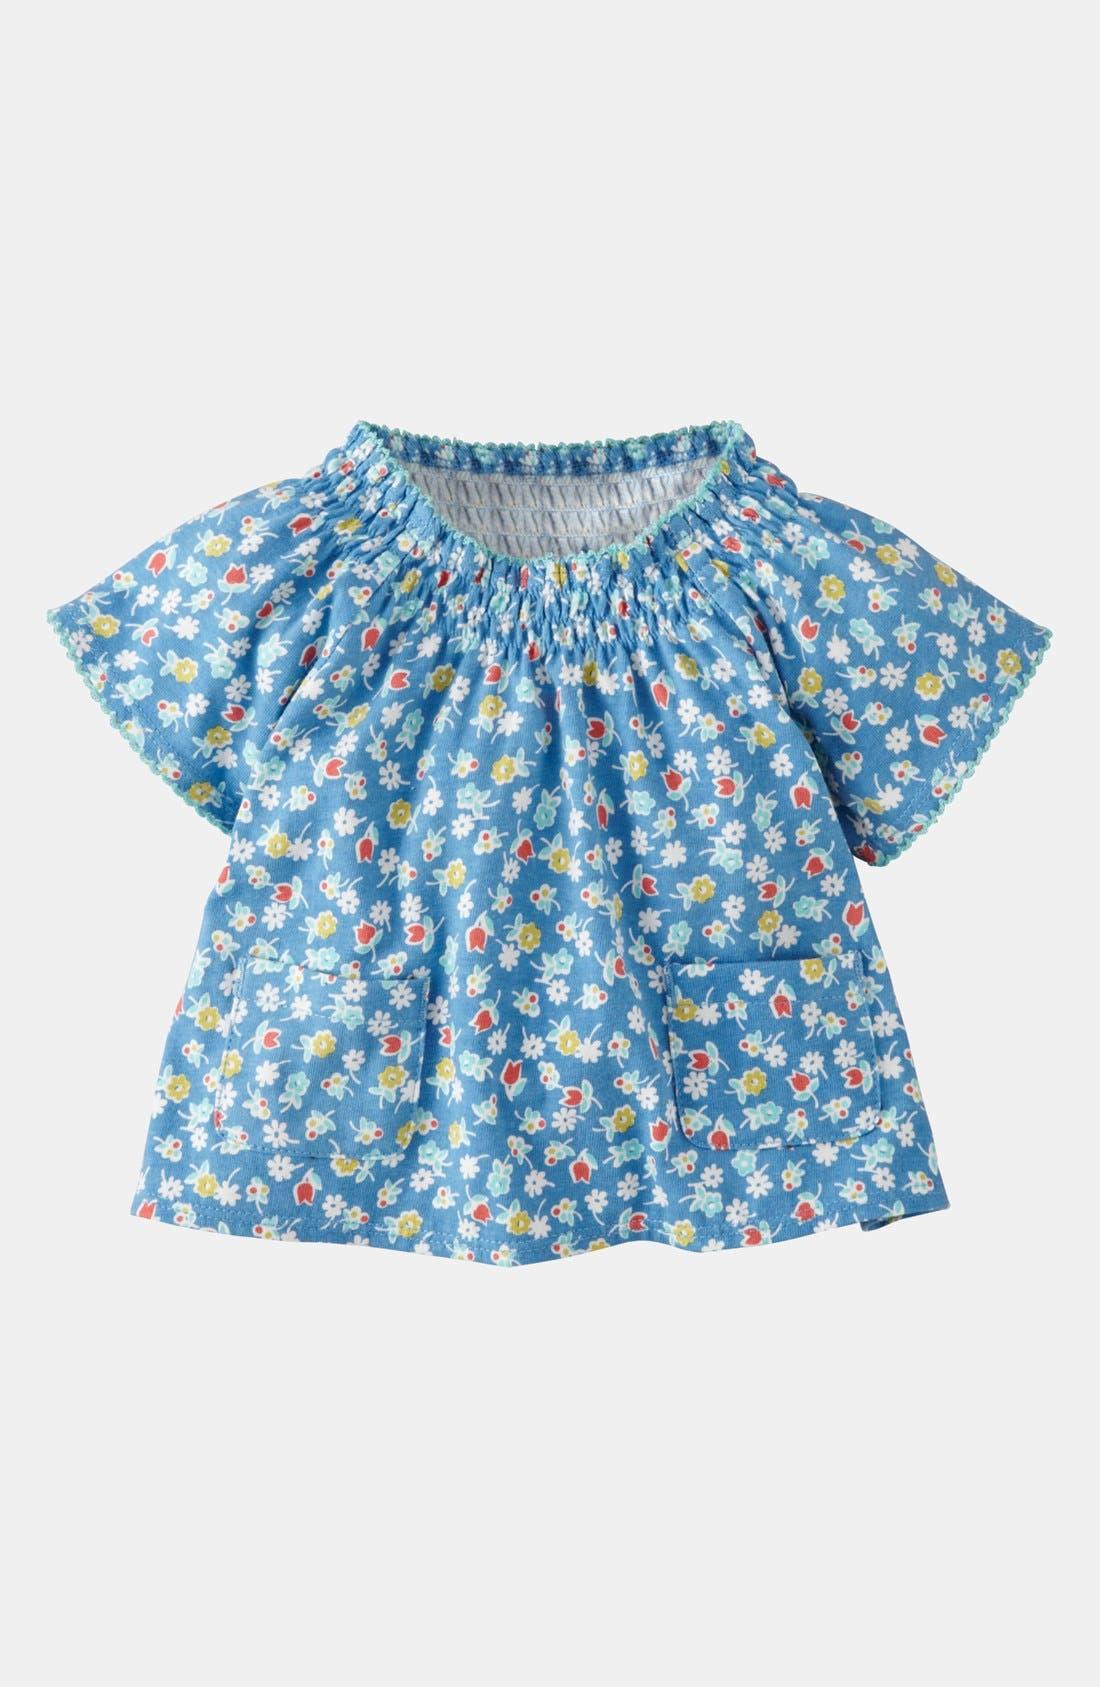 Main Image - Mini Boden Ditsy Print Top (Baby)